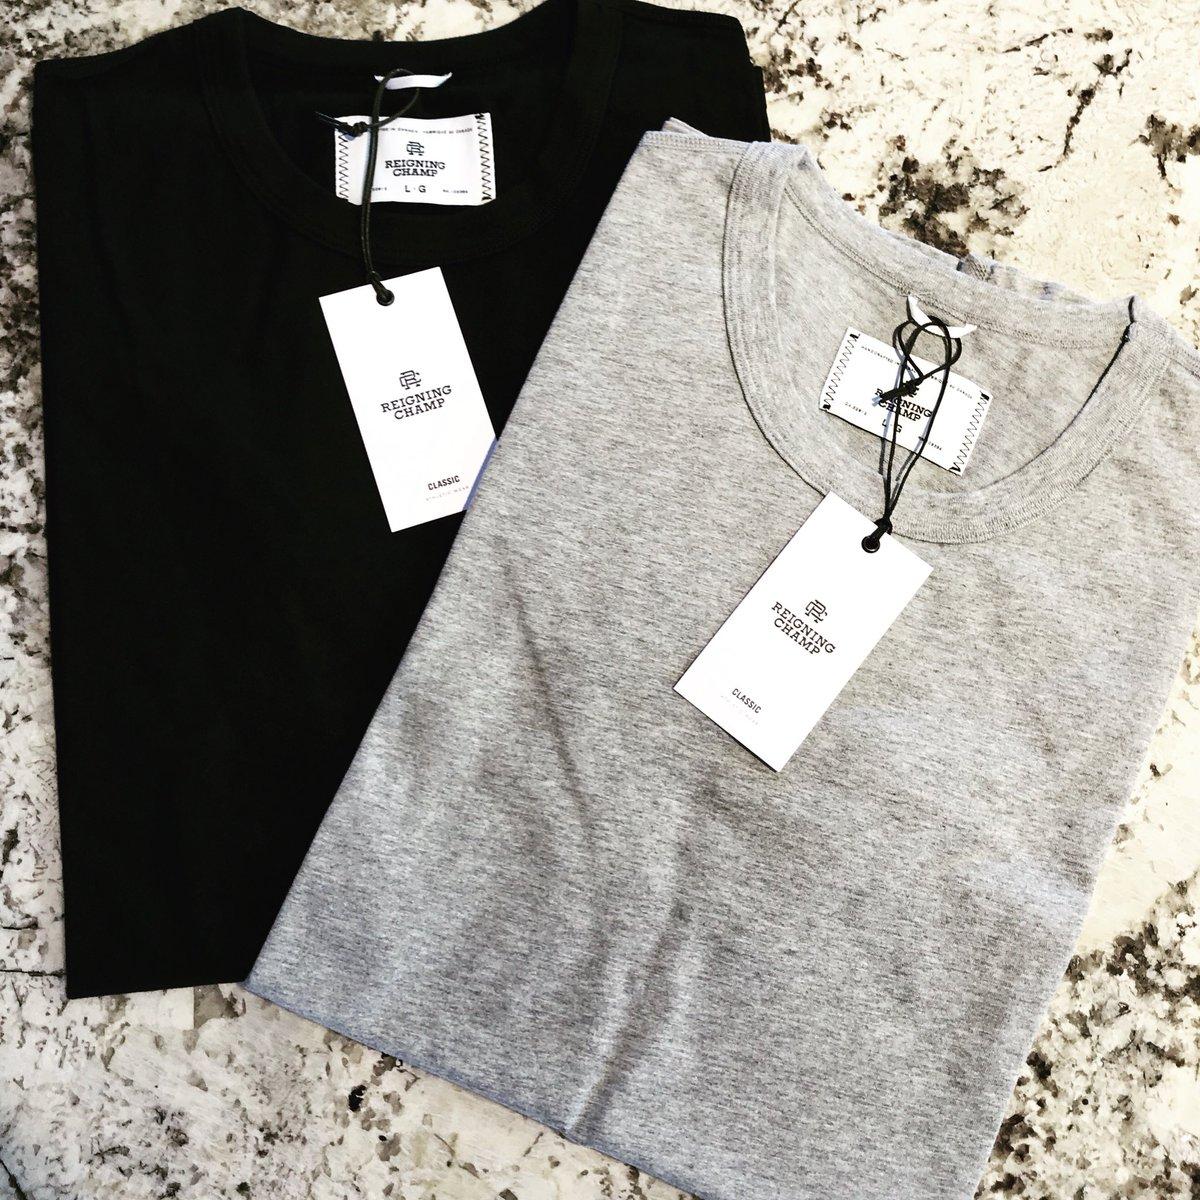 Xxl women's clothing online shops